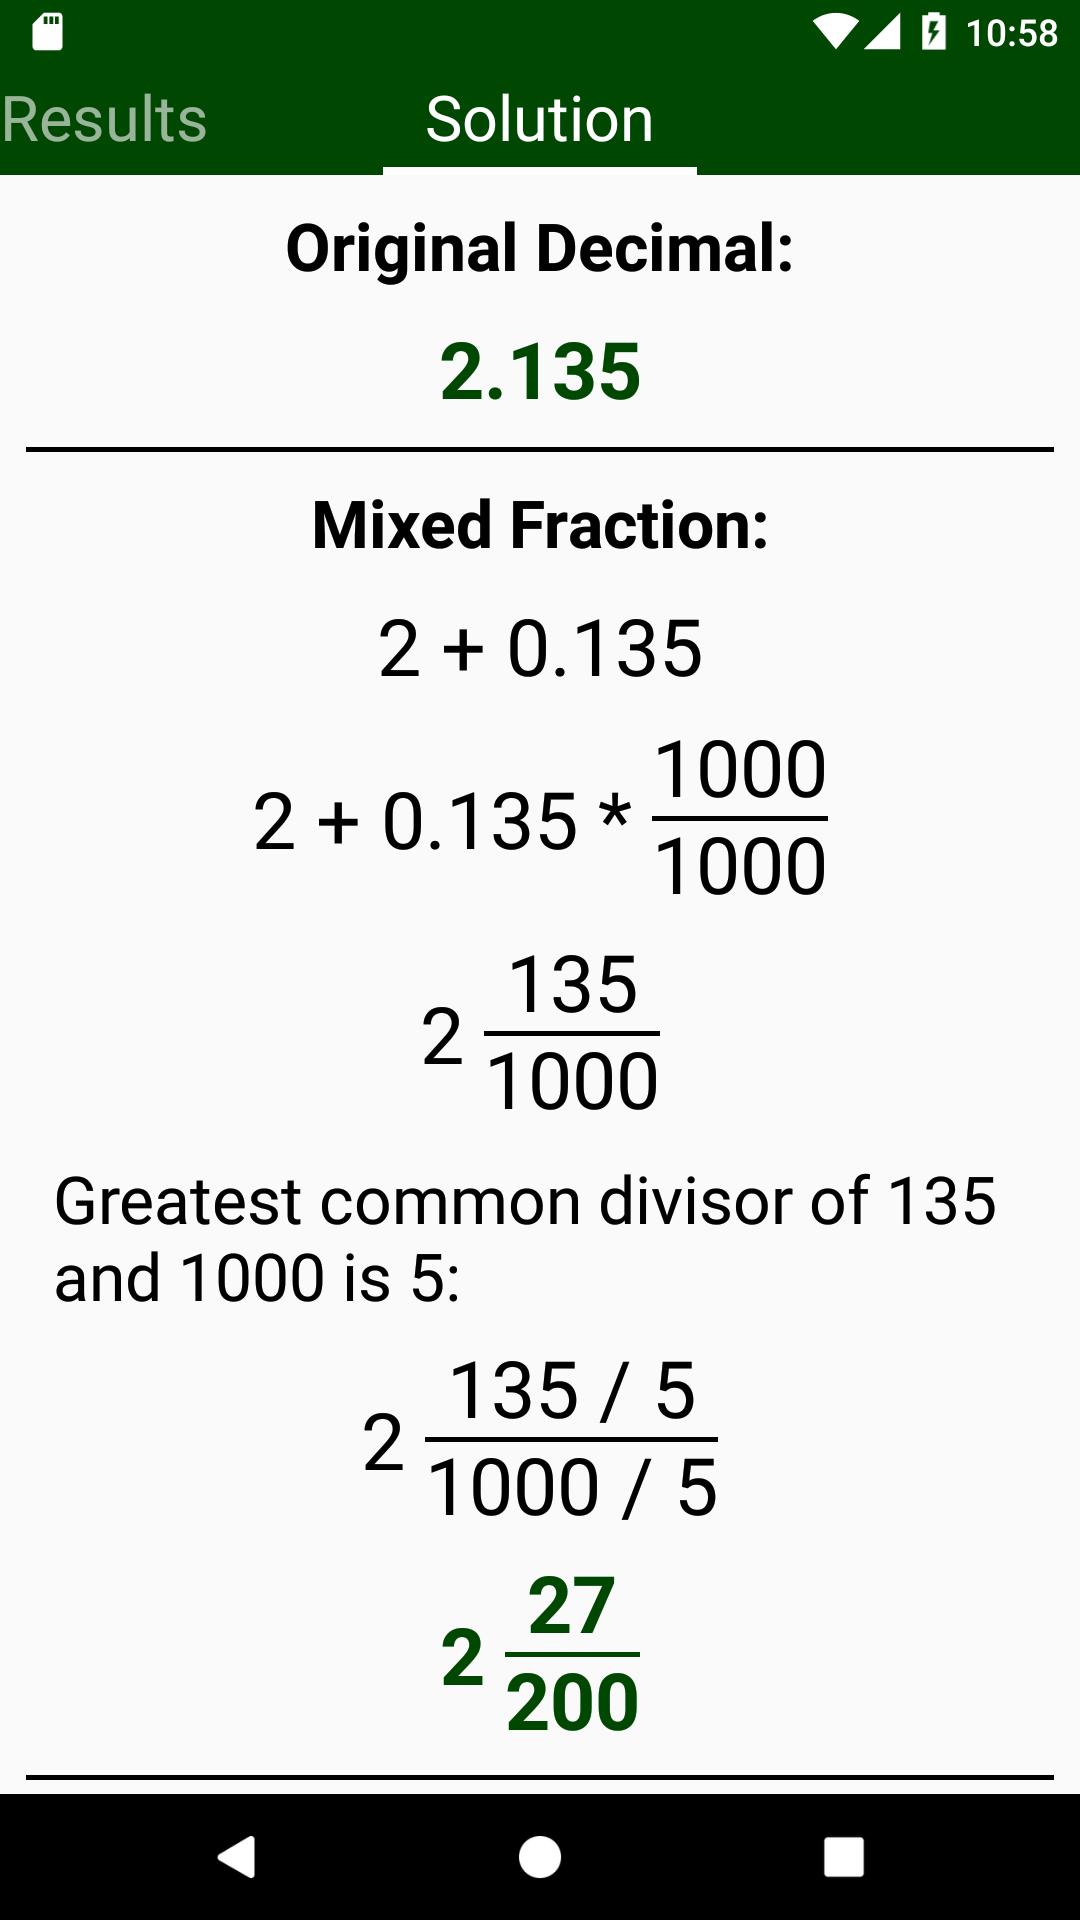 Fraction to decimal calculator betting line joelmir betting frases de amistad